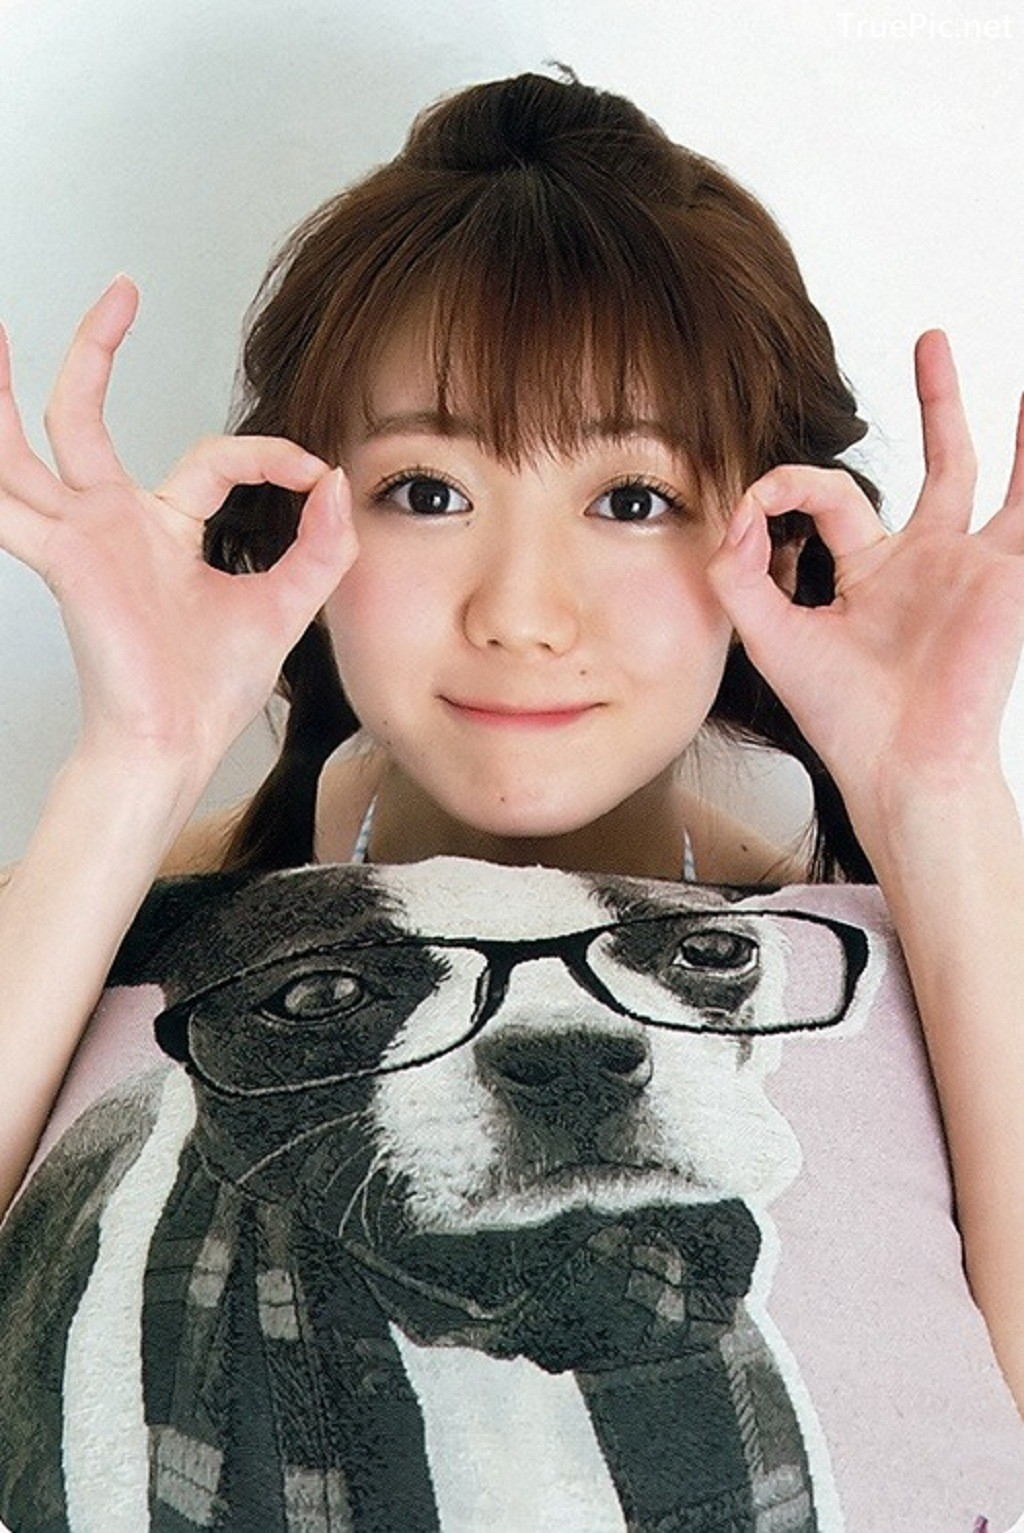 Image Japanese Singer And Idol - Otani Emiri - [Young Animal] 2019 No.13 - TruePic.net - Picture-10